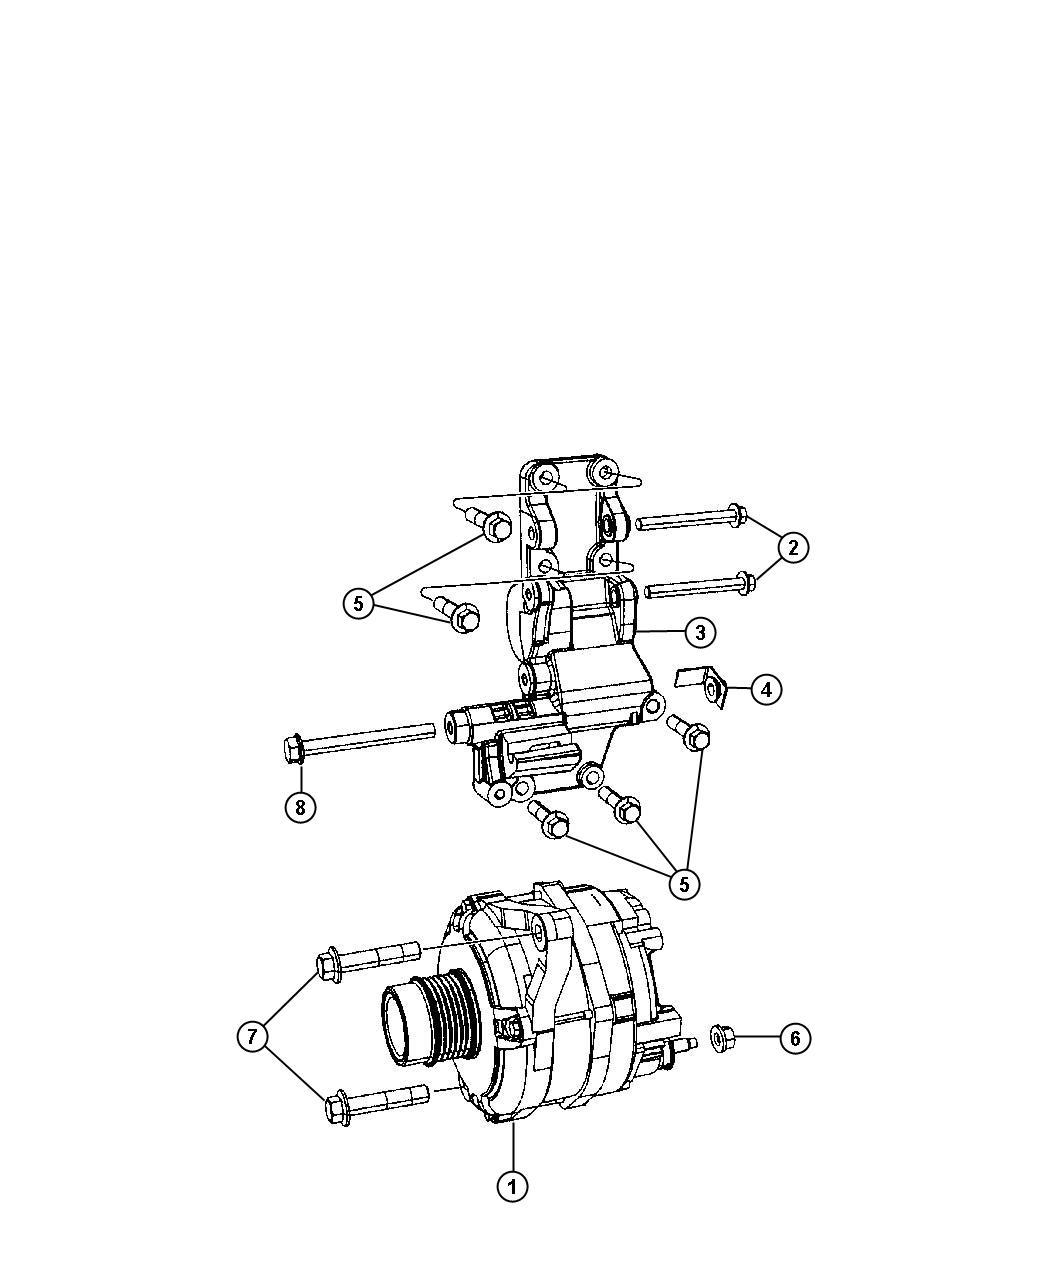 Jeep Patriot Generator Engine Remanufactured 140 Amp